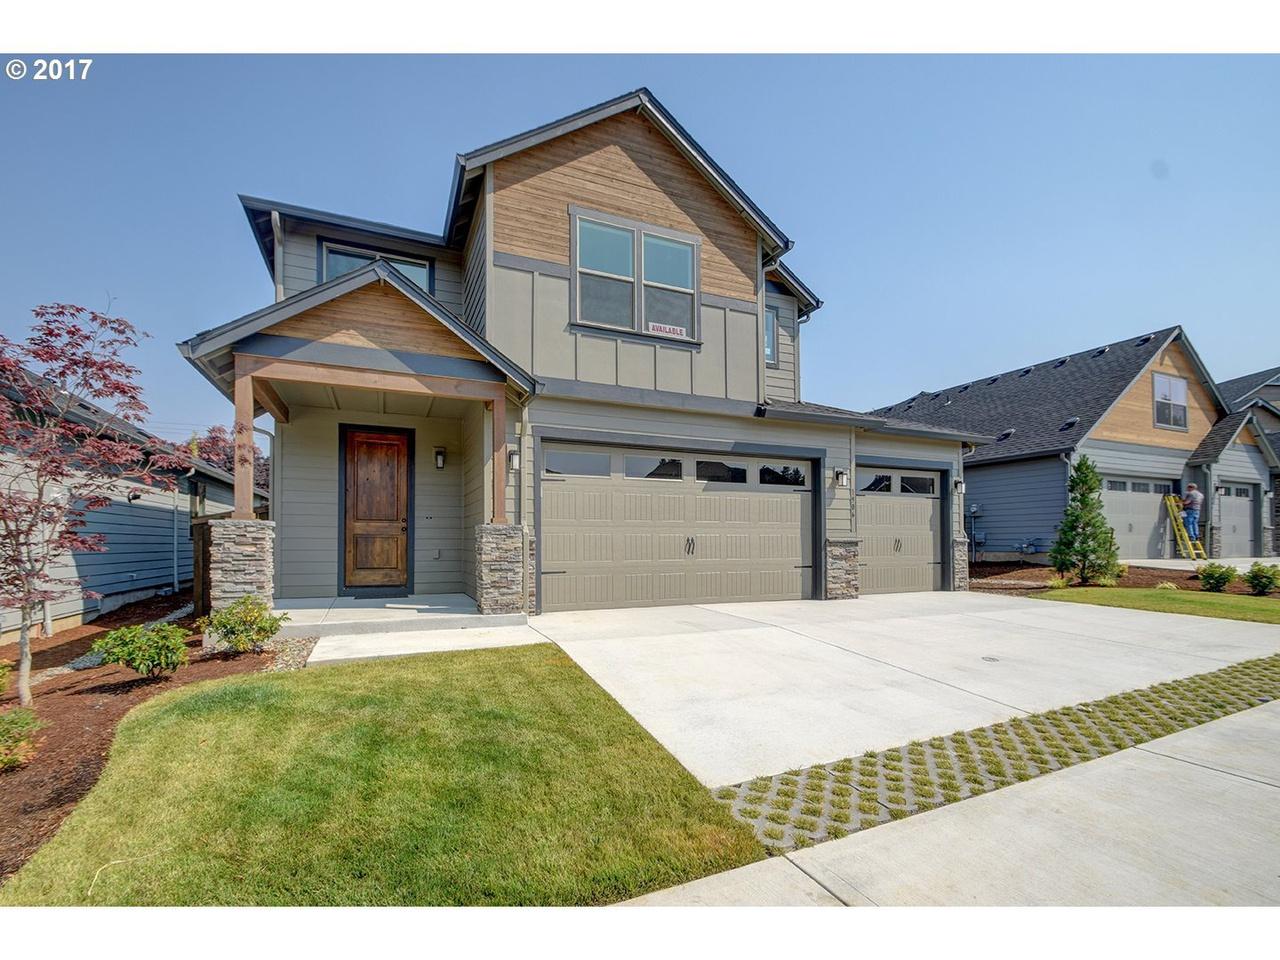 1906 nw 118th way vancouver wa 98685 mls 16136675 for Vancouver washington home builders